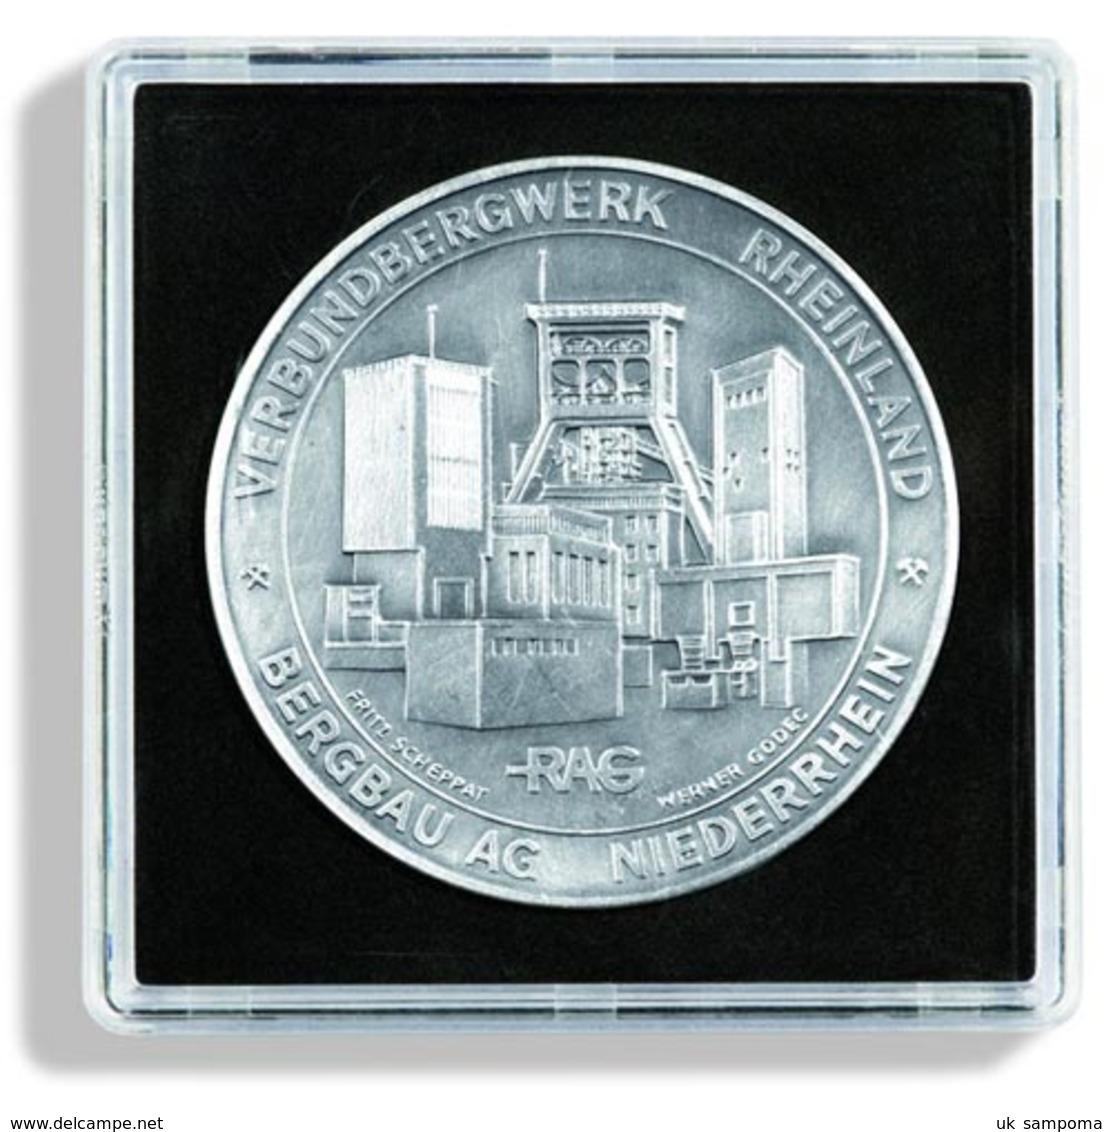 QUADRUM Mini Coin Capsules 18 Mm, Pack Of 10 - Supplies And Equipment